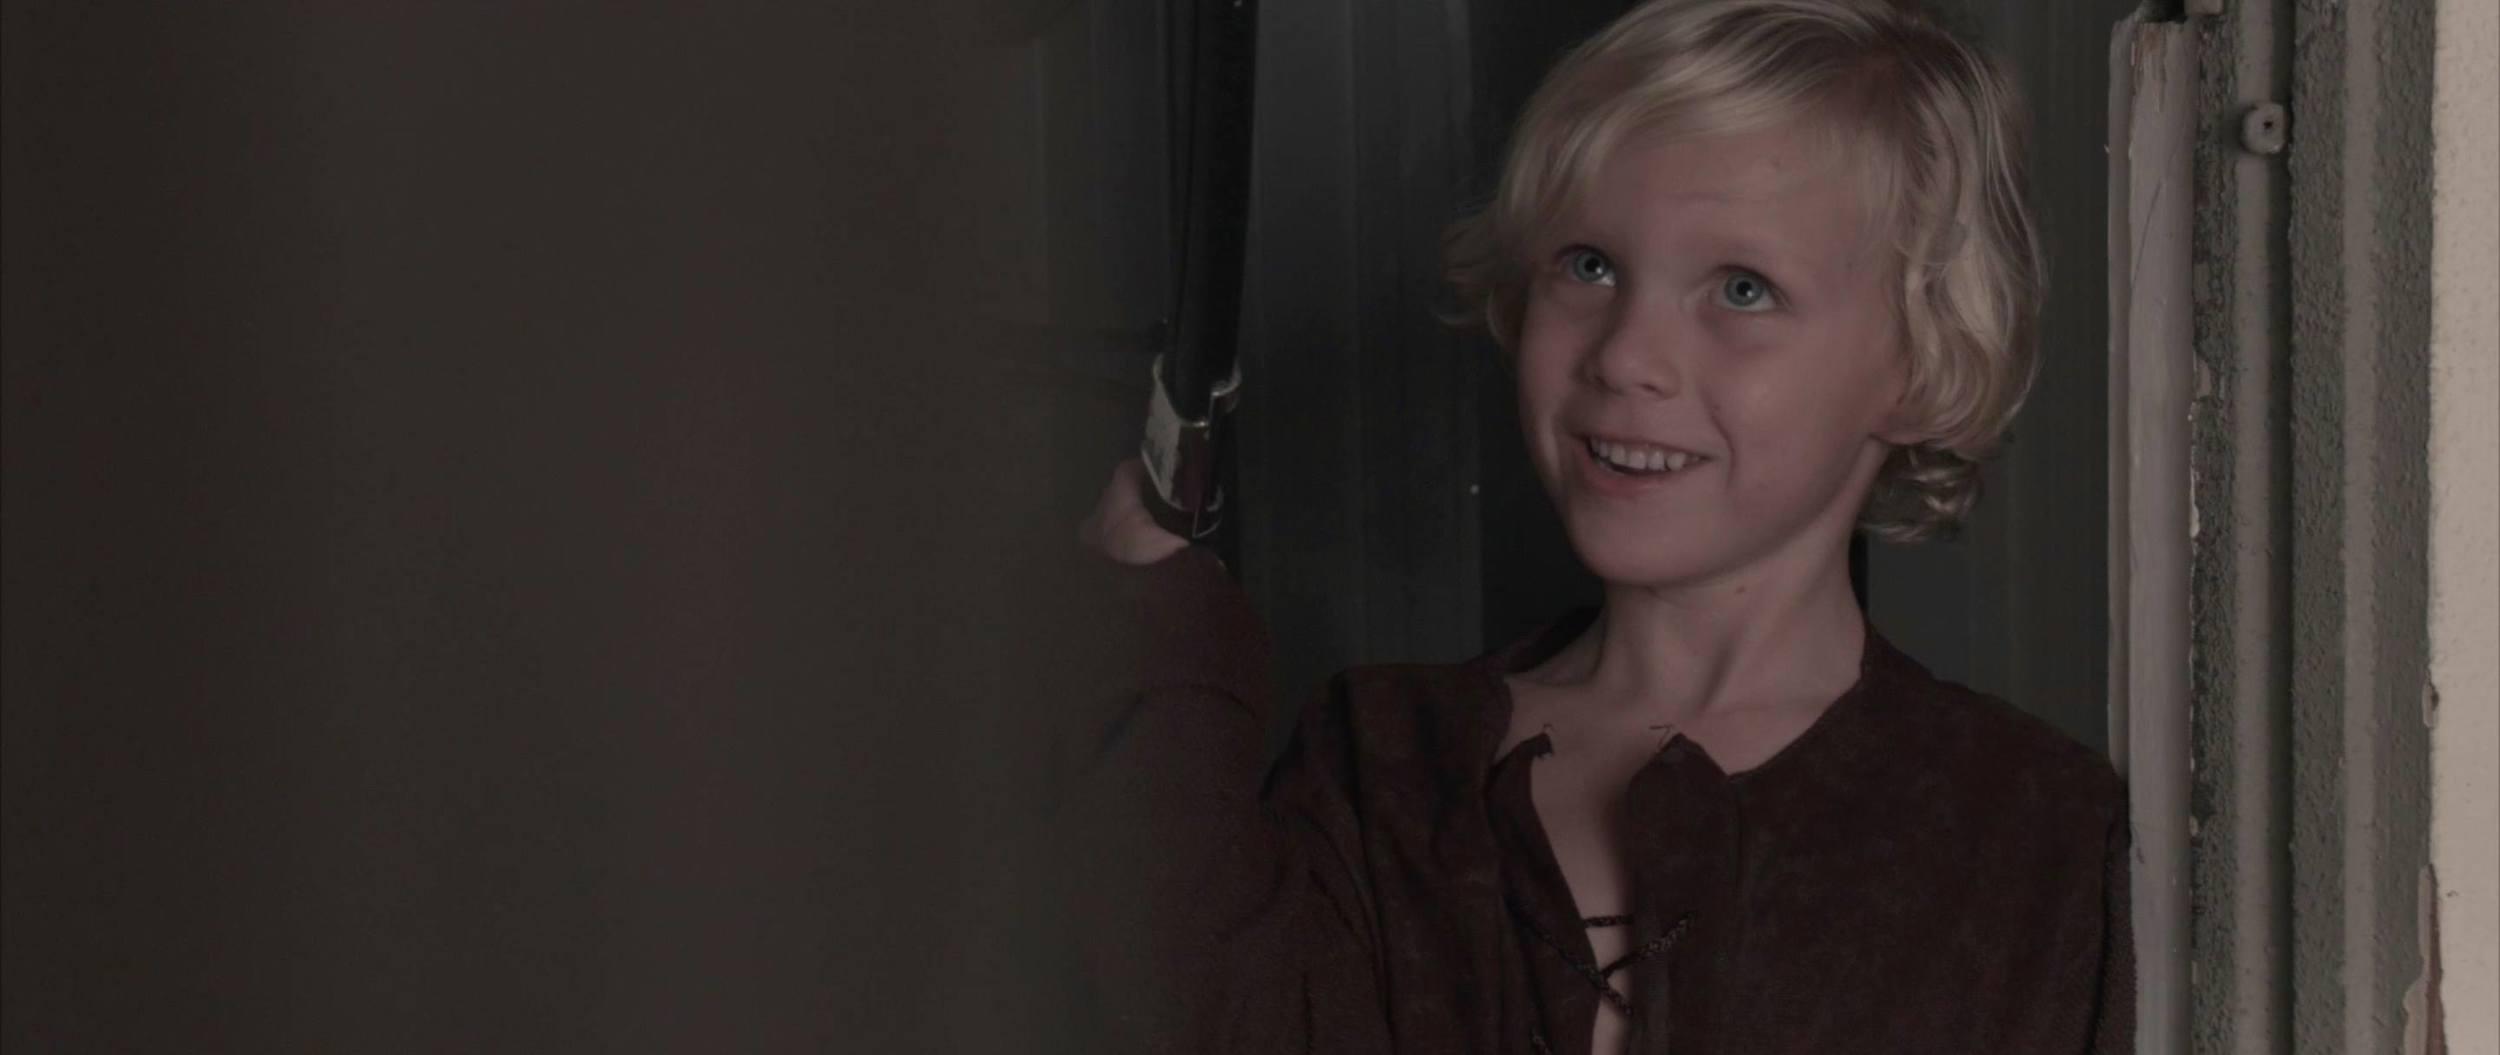 "Lucas Royalty as ""Gus"" in CHARMING."